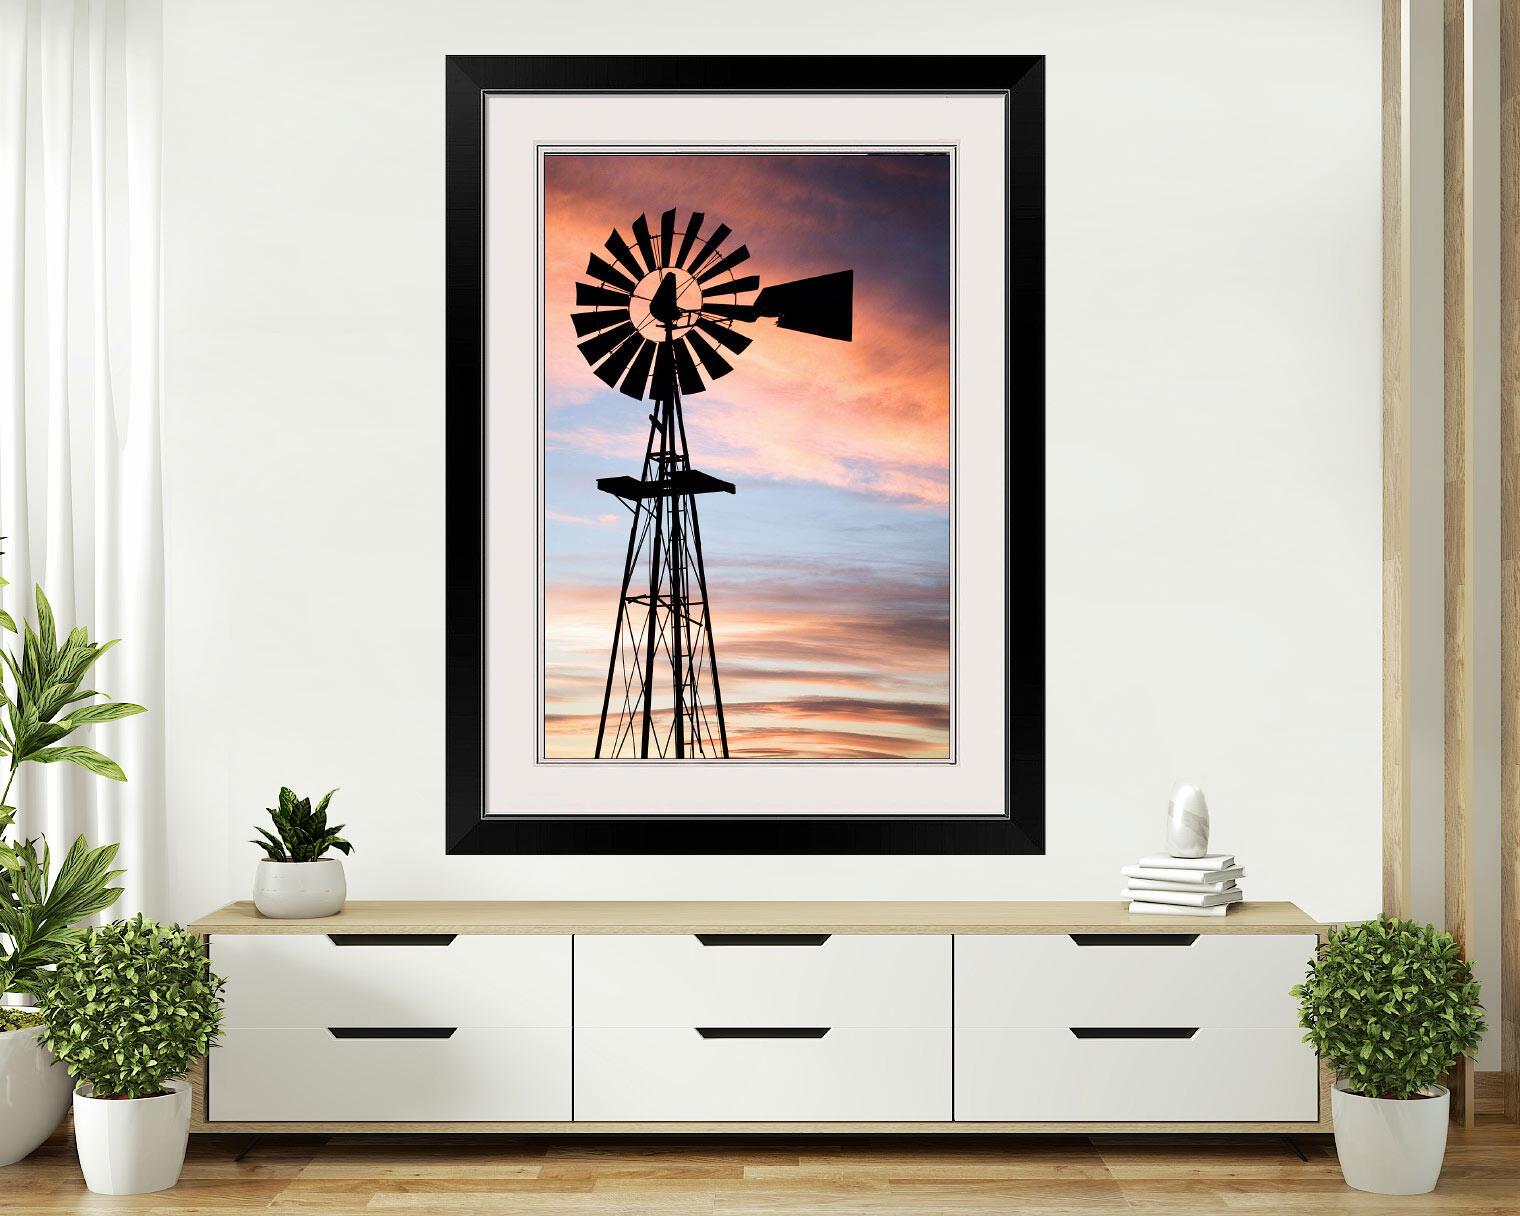 Vintage Rustic Farm Windmill